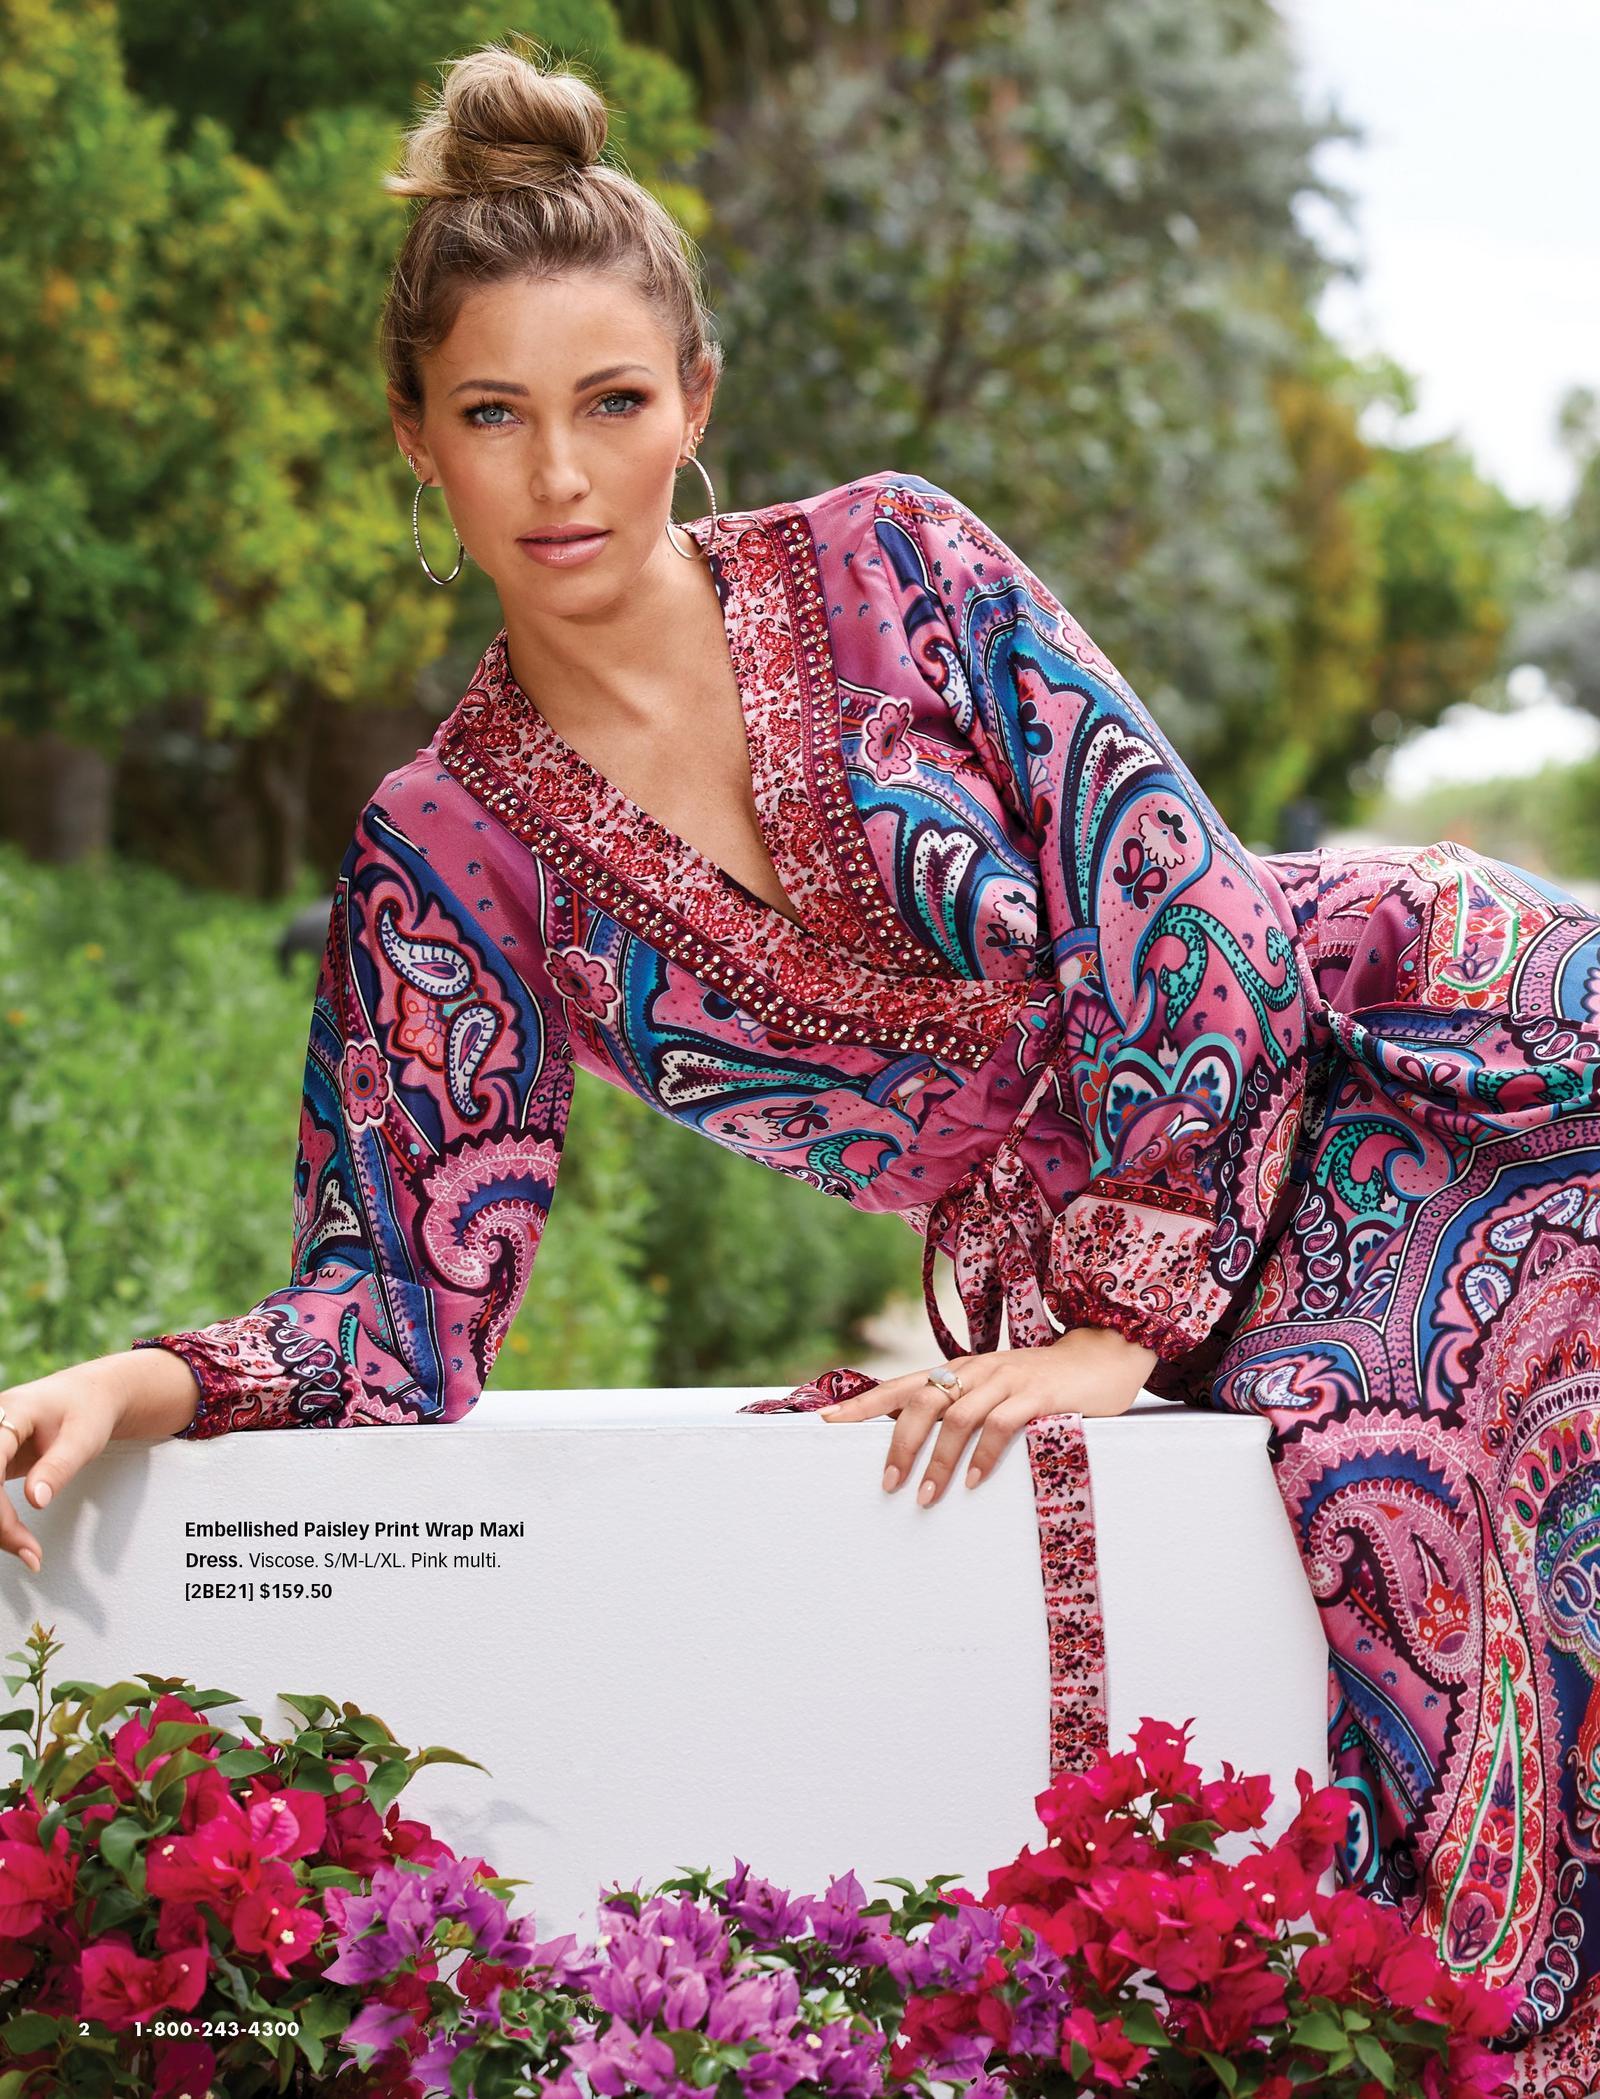 model wearing a multicolored paisley print long-sleeve maxi wrap dress.